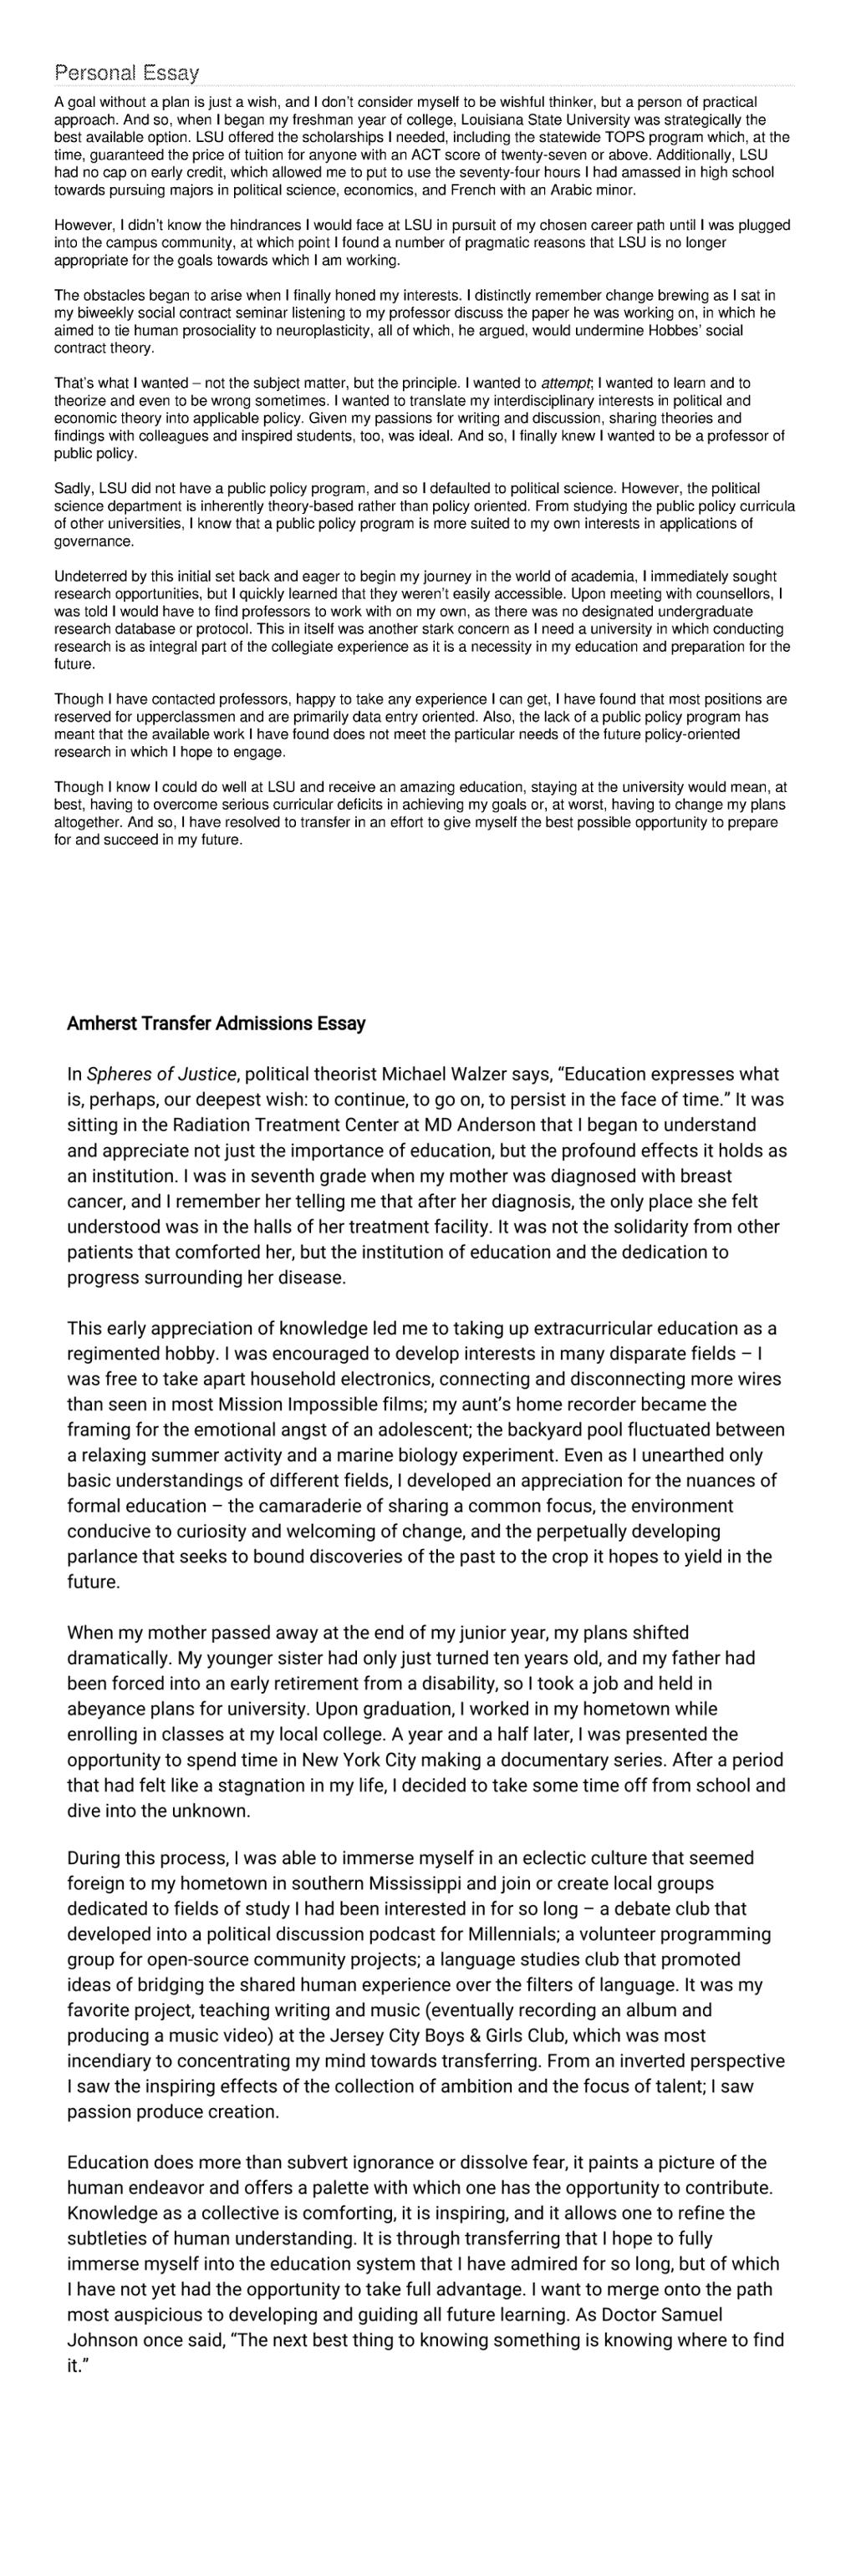 Help writing transfer essay